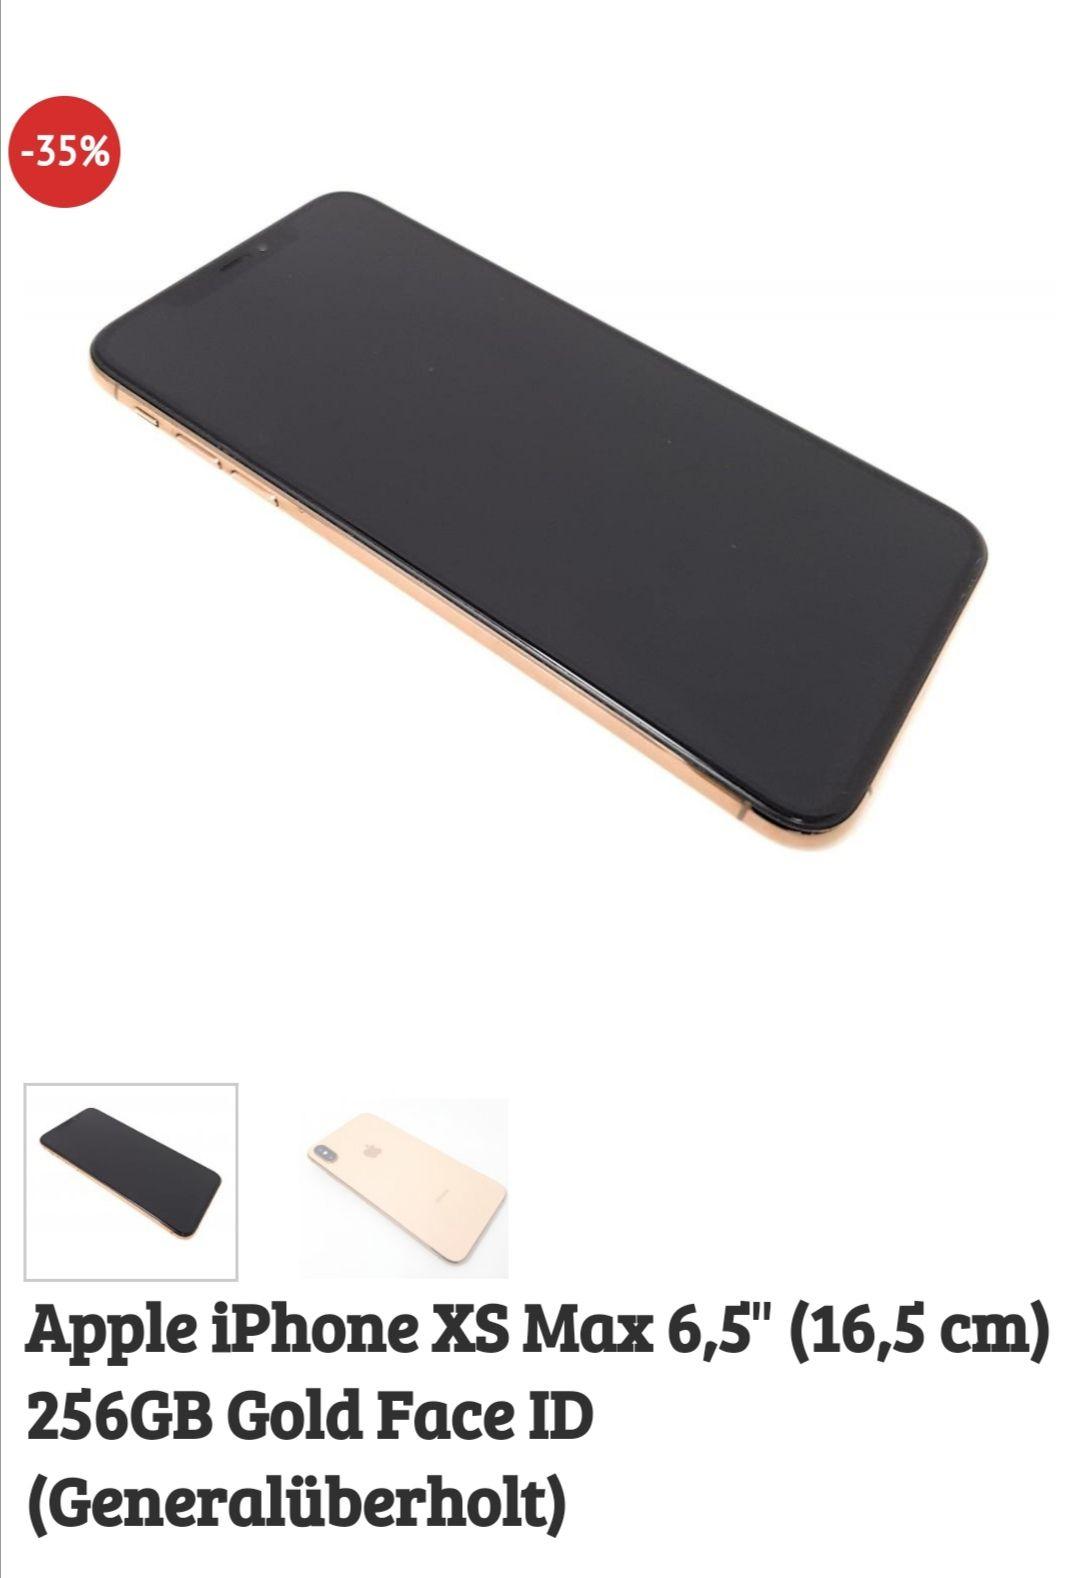 Apple iPhone XS Max 256gb Gold refurbished 24 Monate Gewährleistung @Dealclub